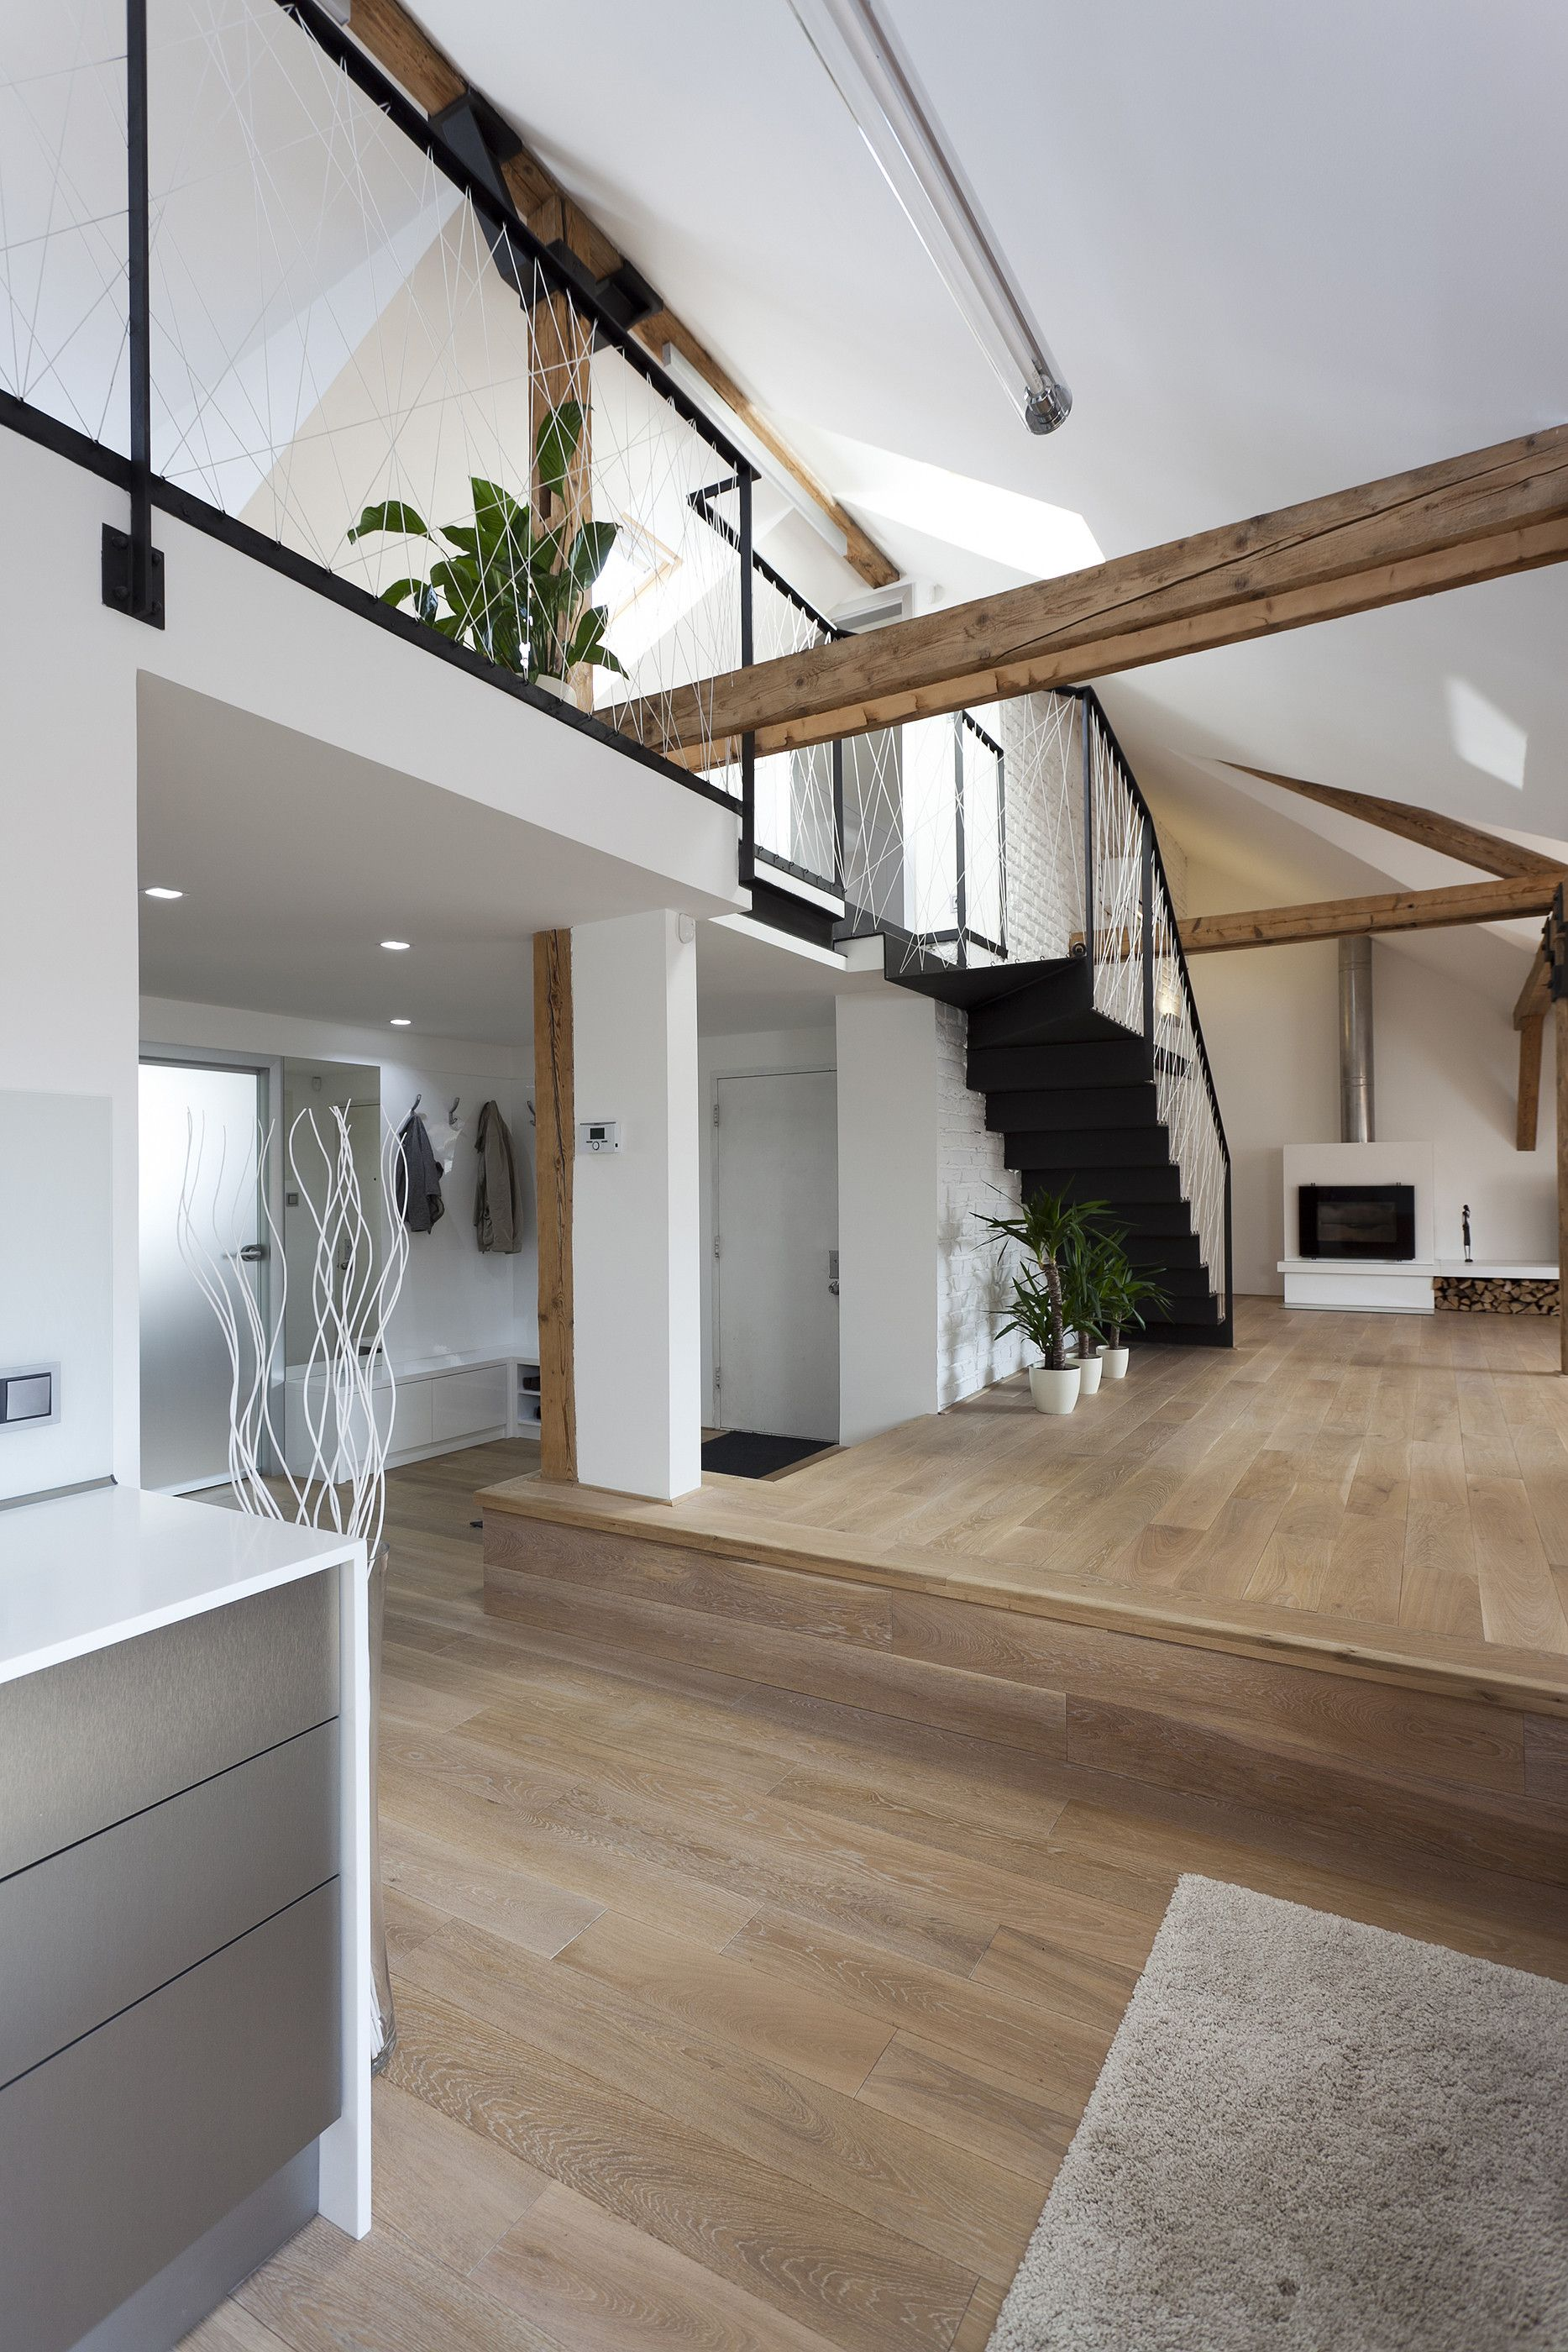 Attic Loft Reconstruction, Alexandra Timpau